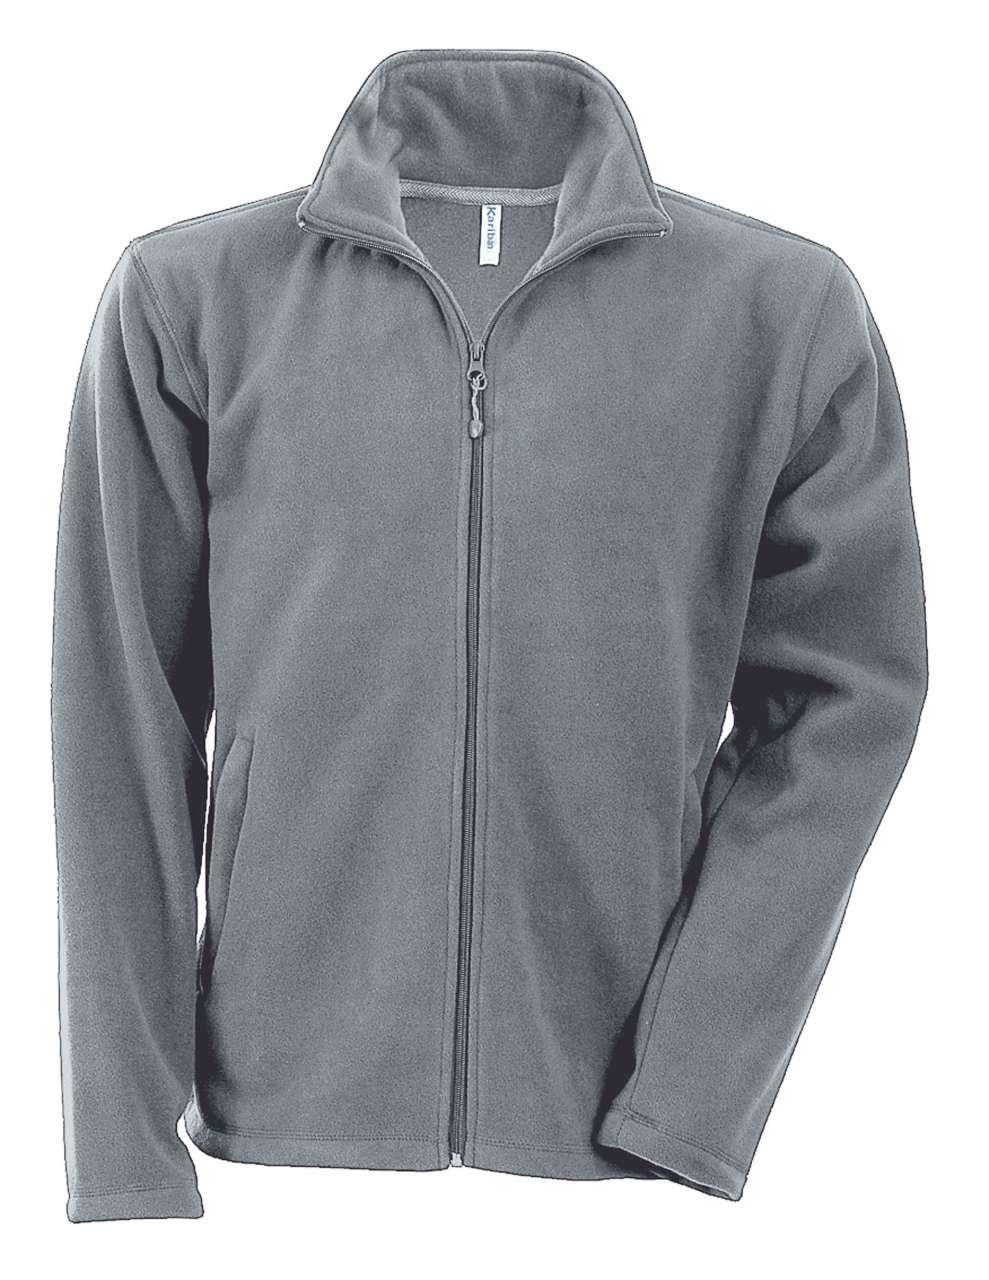 Fleece KA911 convoy grey veste jachete dama barbatesti polar fleece softshell fas gluga ploaie vant broderie serigrafie termotransfer | Toroadv.ro